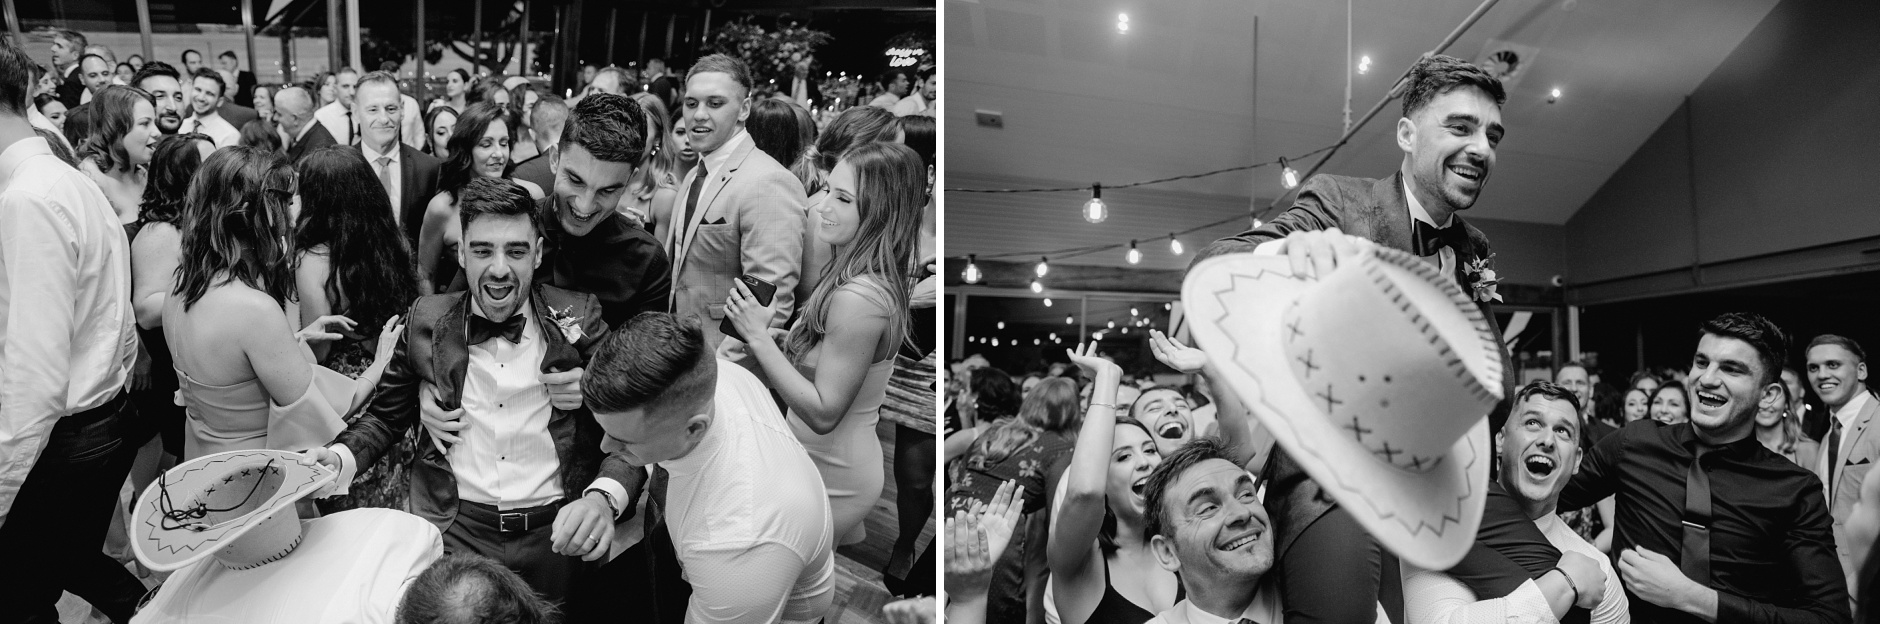 Sydney-Wedding-Photographer_0155.jpg